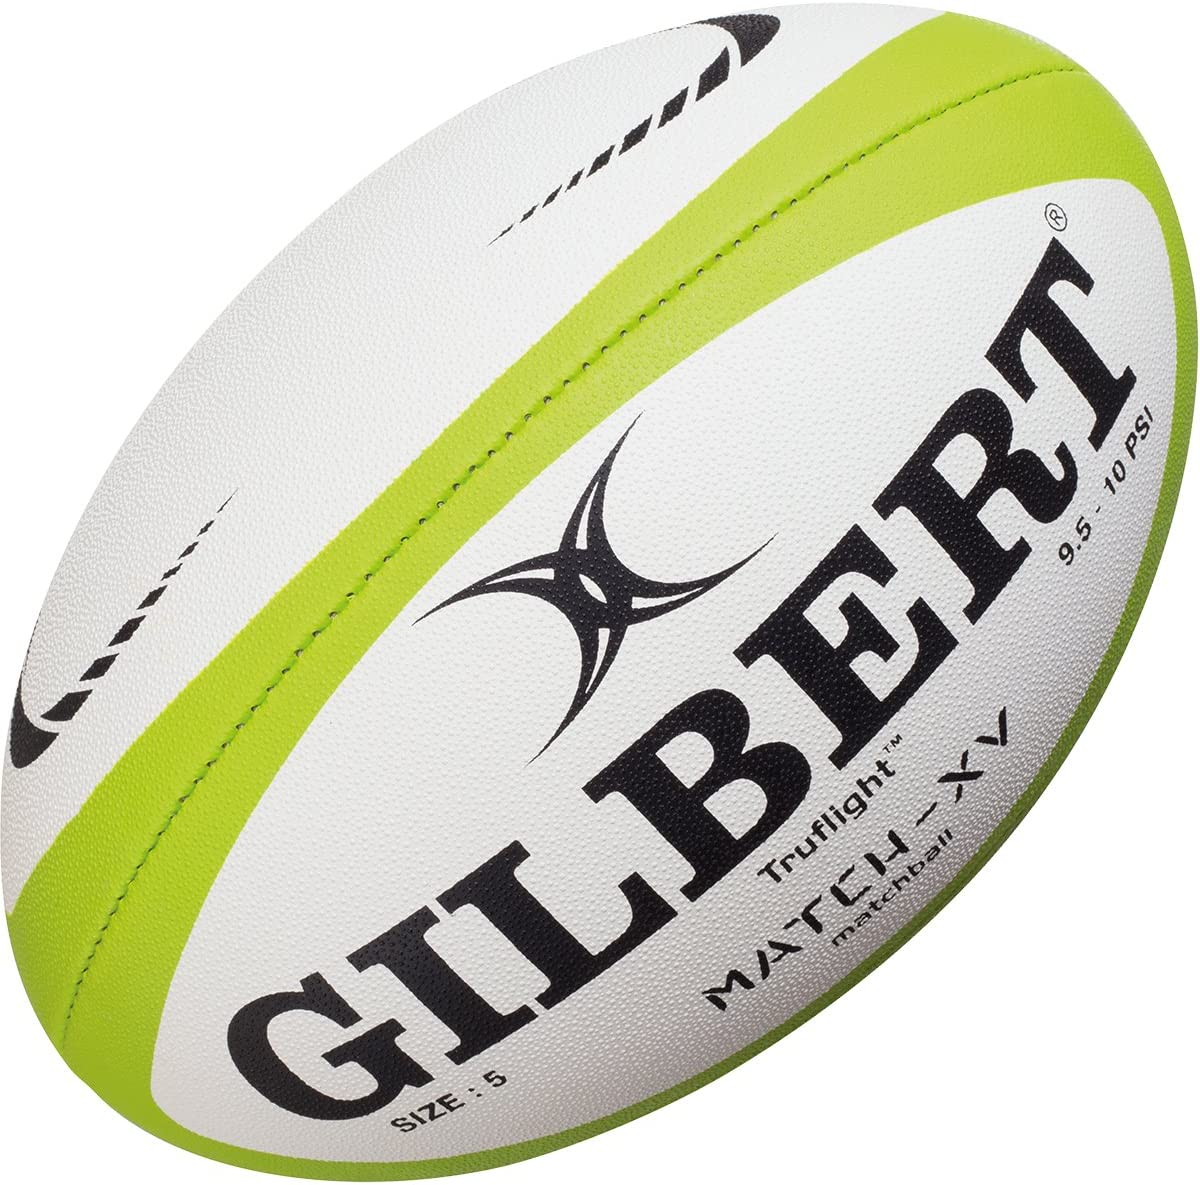 Gilbert Rugby Hand-Stitched Revolution X Match Ball Size 5